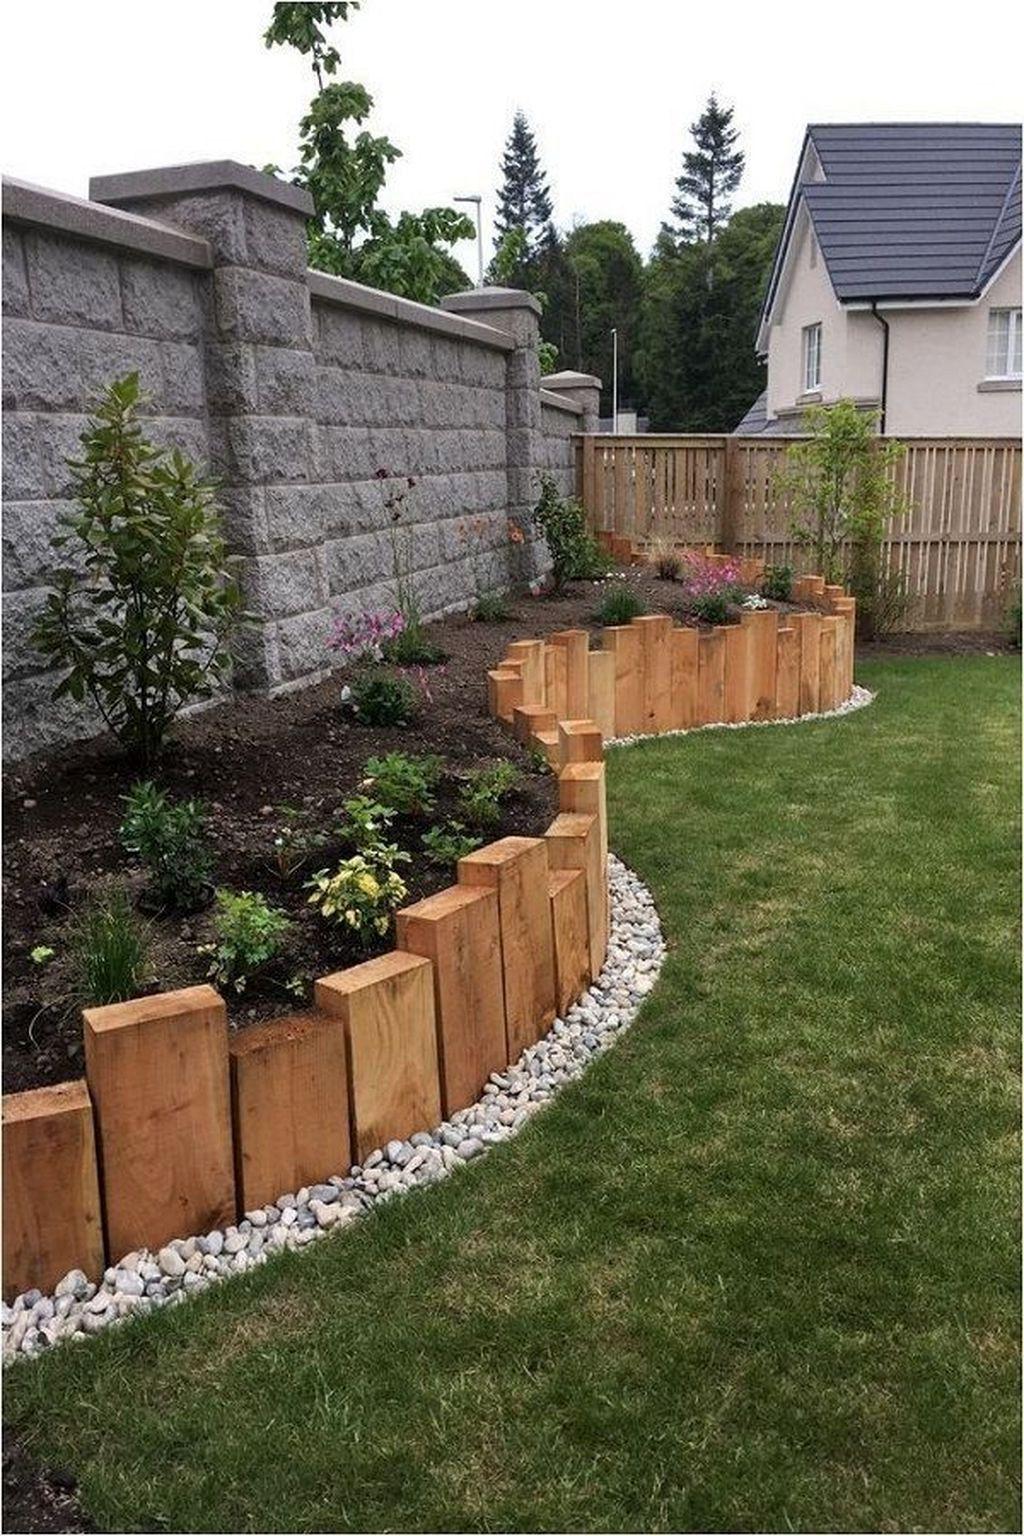 Photo of 29 Awesome Modern Backyard Landscaping Ideas 29 backyard landscaping designs – Best Home Design Ideas